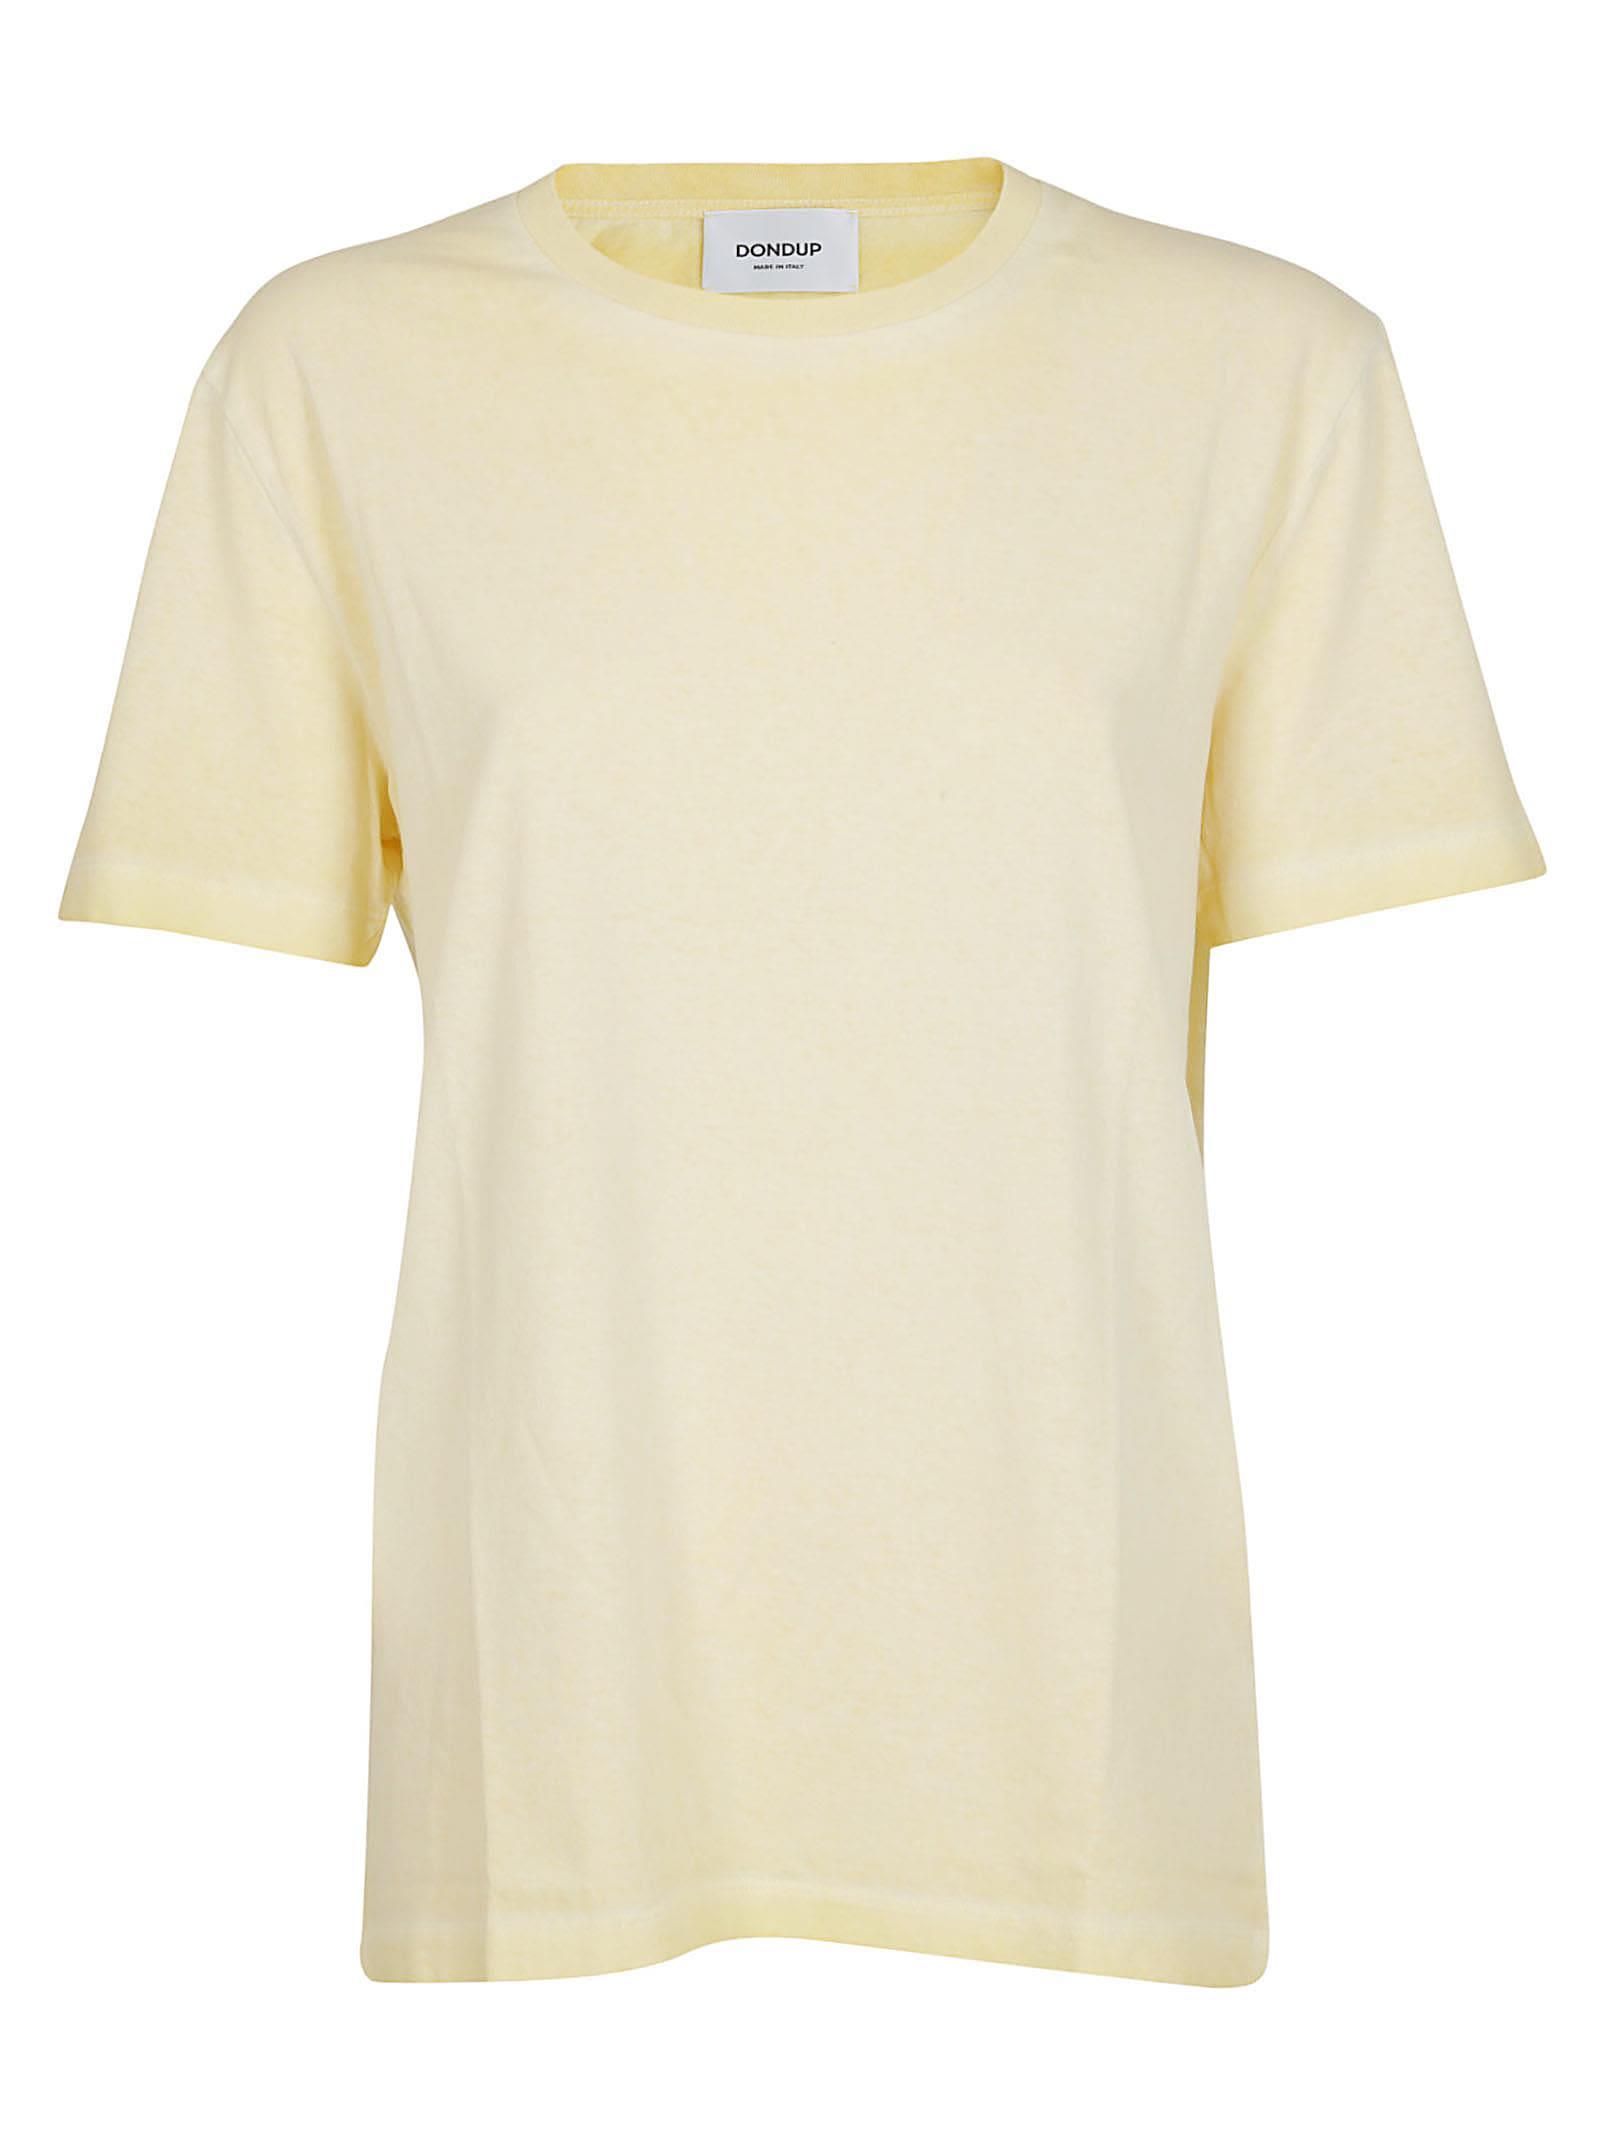 Dondup Slim Fit T-shirt